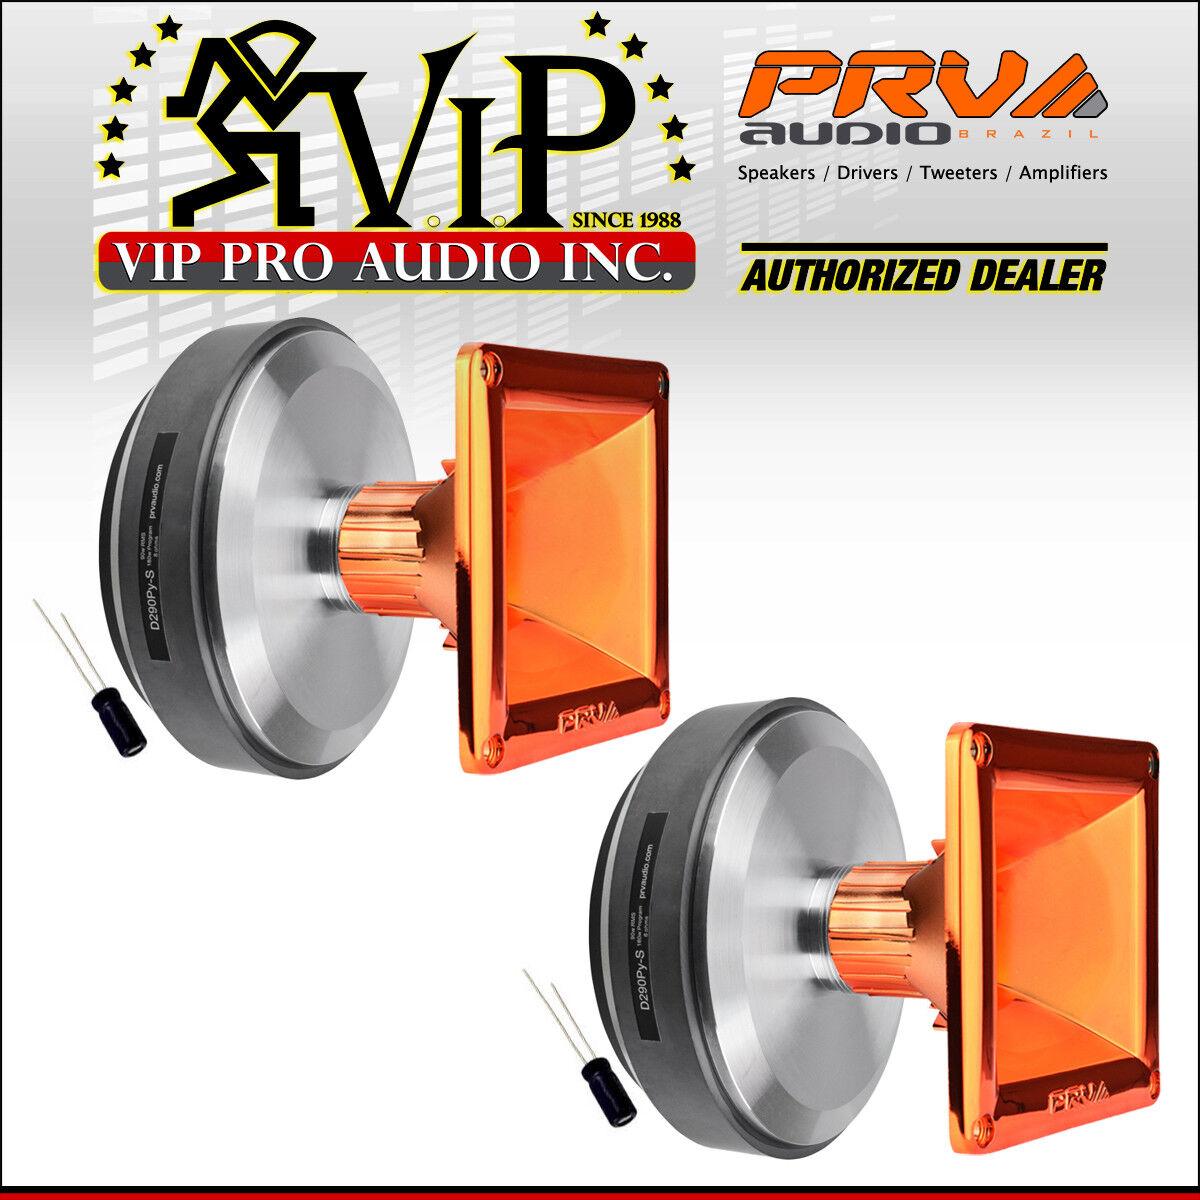 2 x PRV D290Py-S 1  Compression Driver + WG11-25 orange CR Waveguide + CAPACITOR